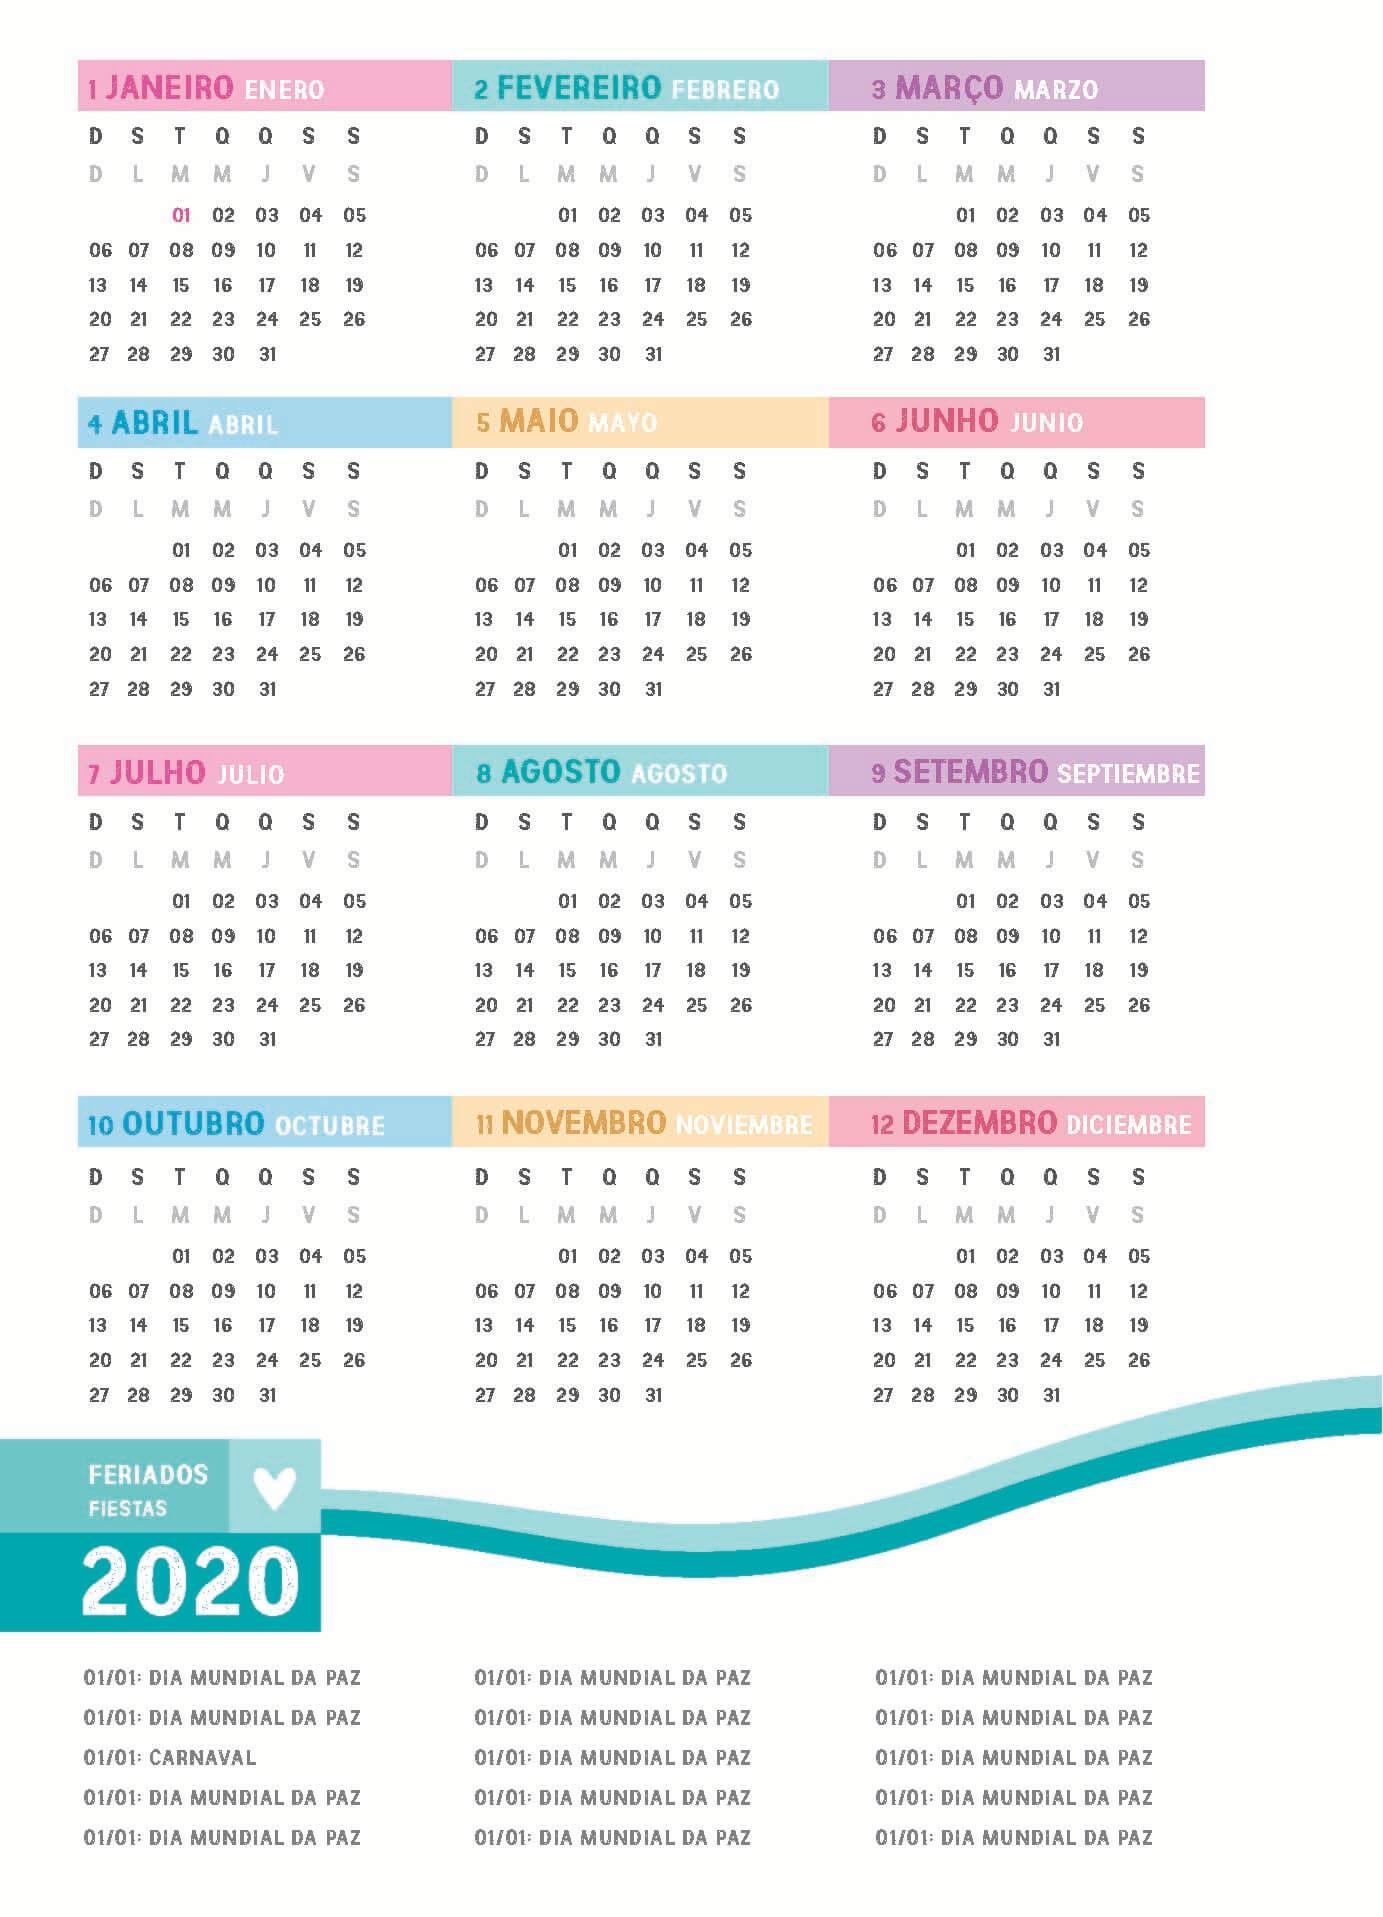 Agenda Diária 352pg 54024/20 Sweetnes